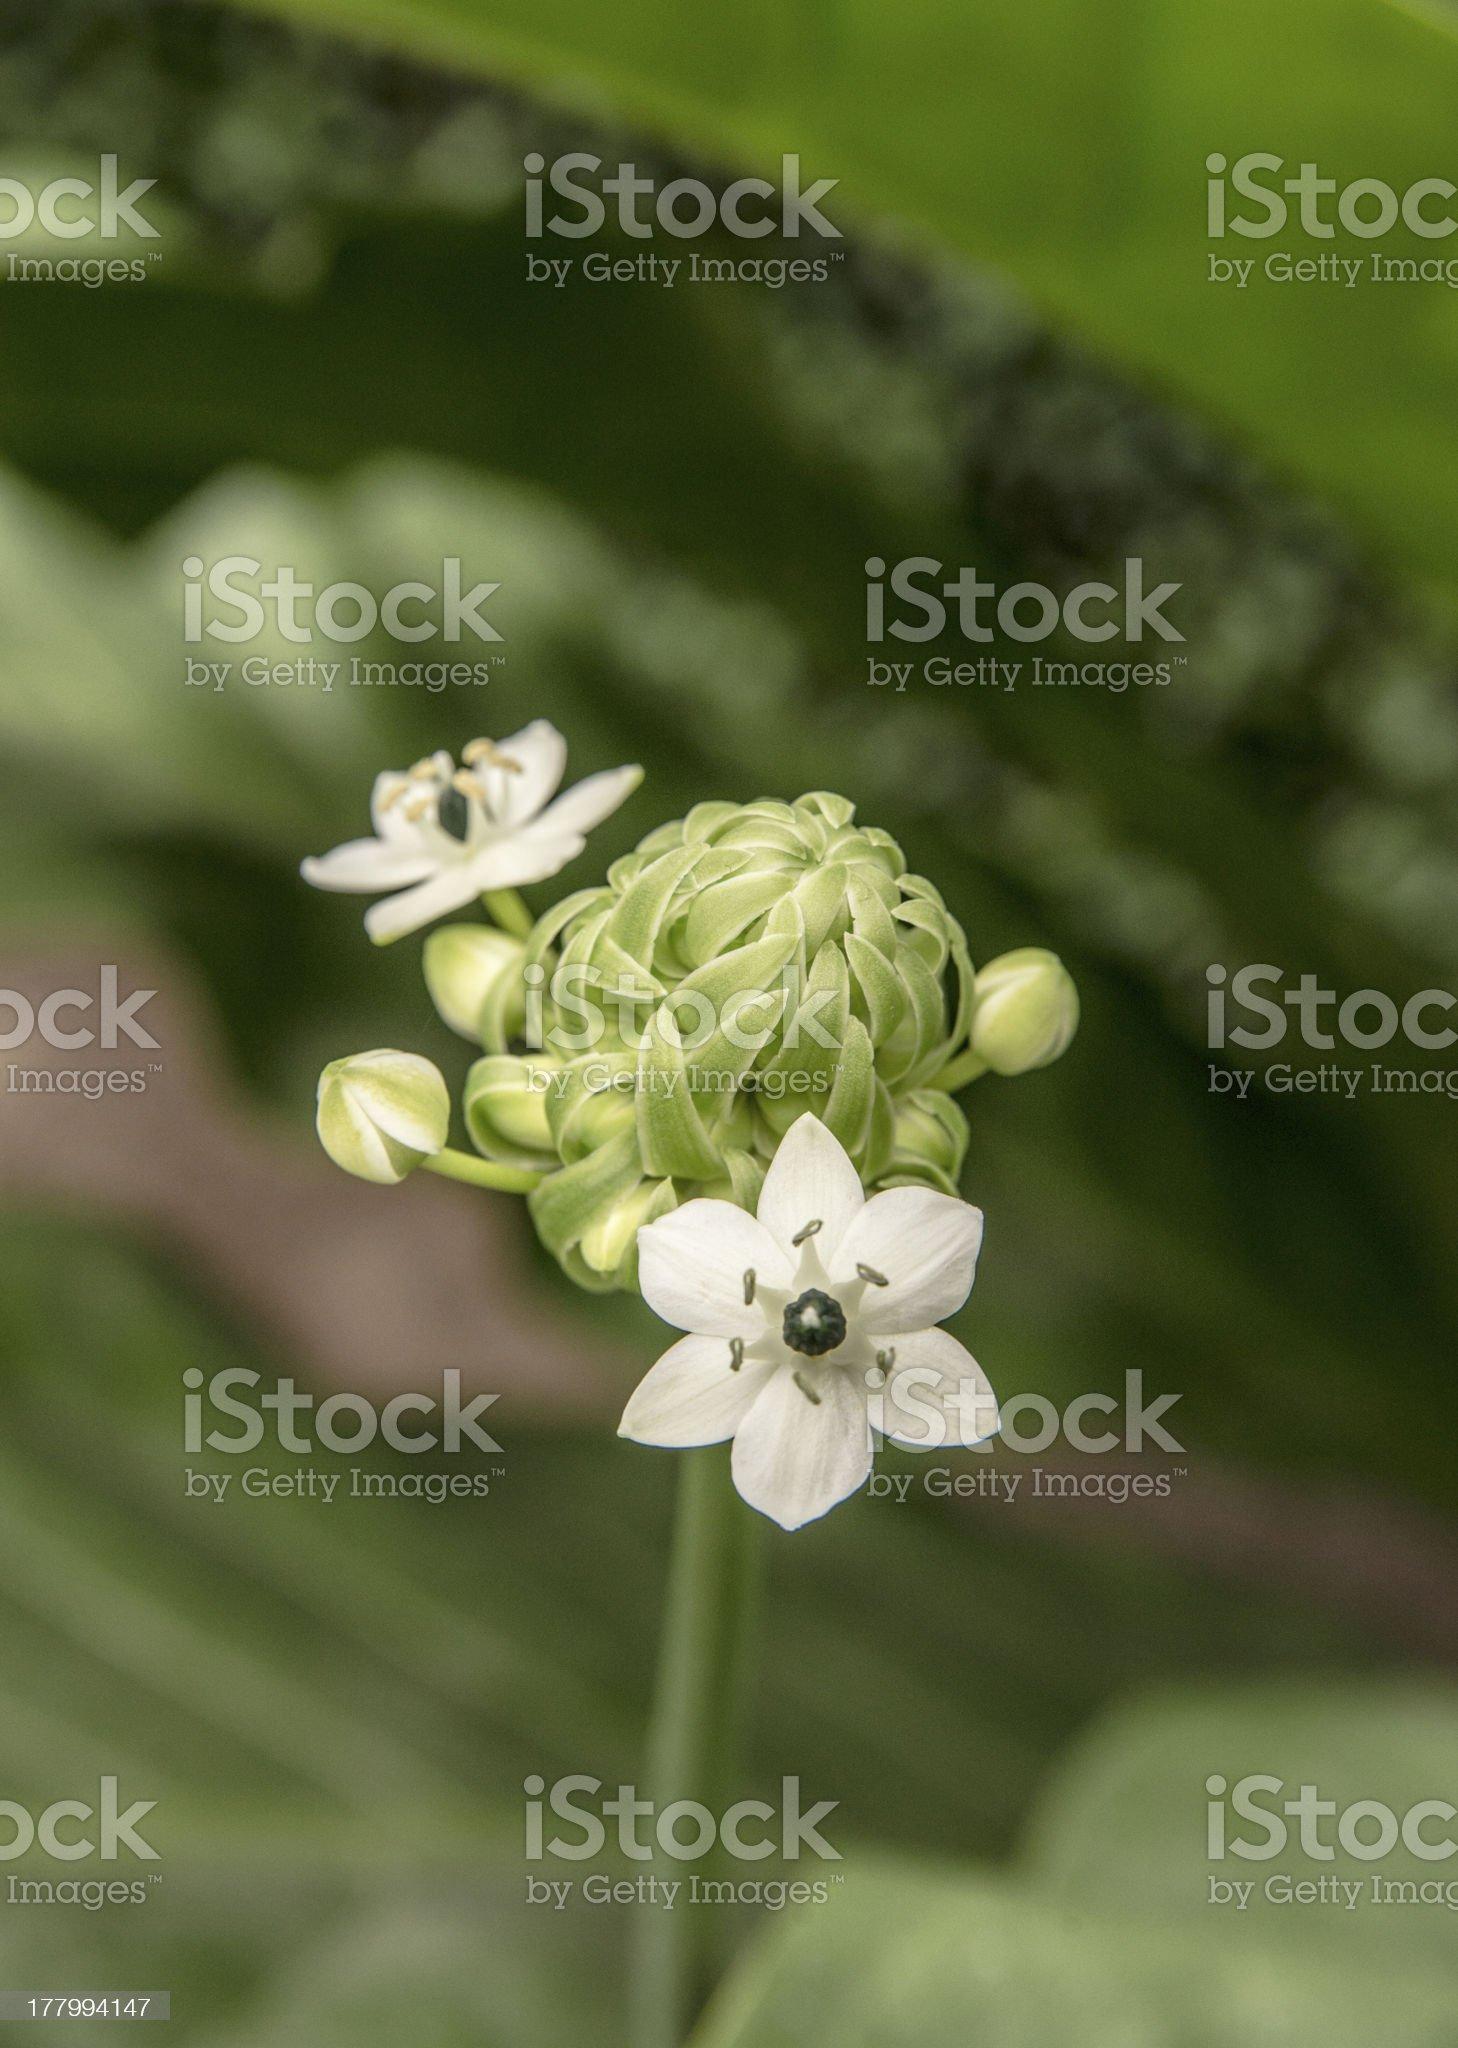 garlic chive flower royalty-free stock photo